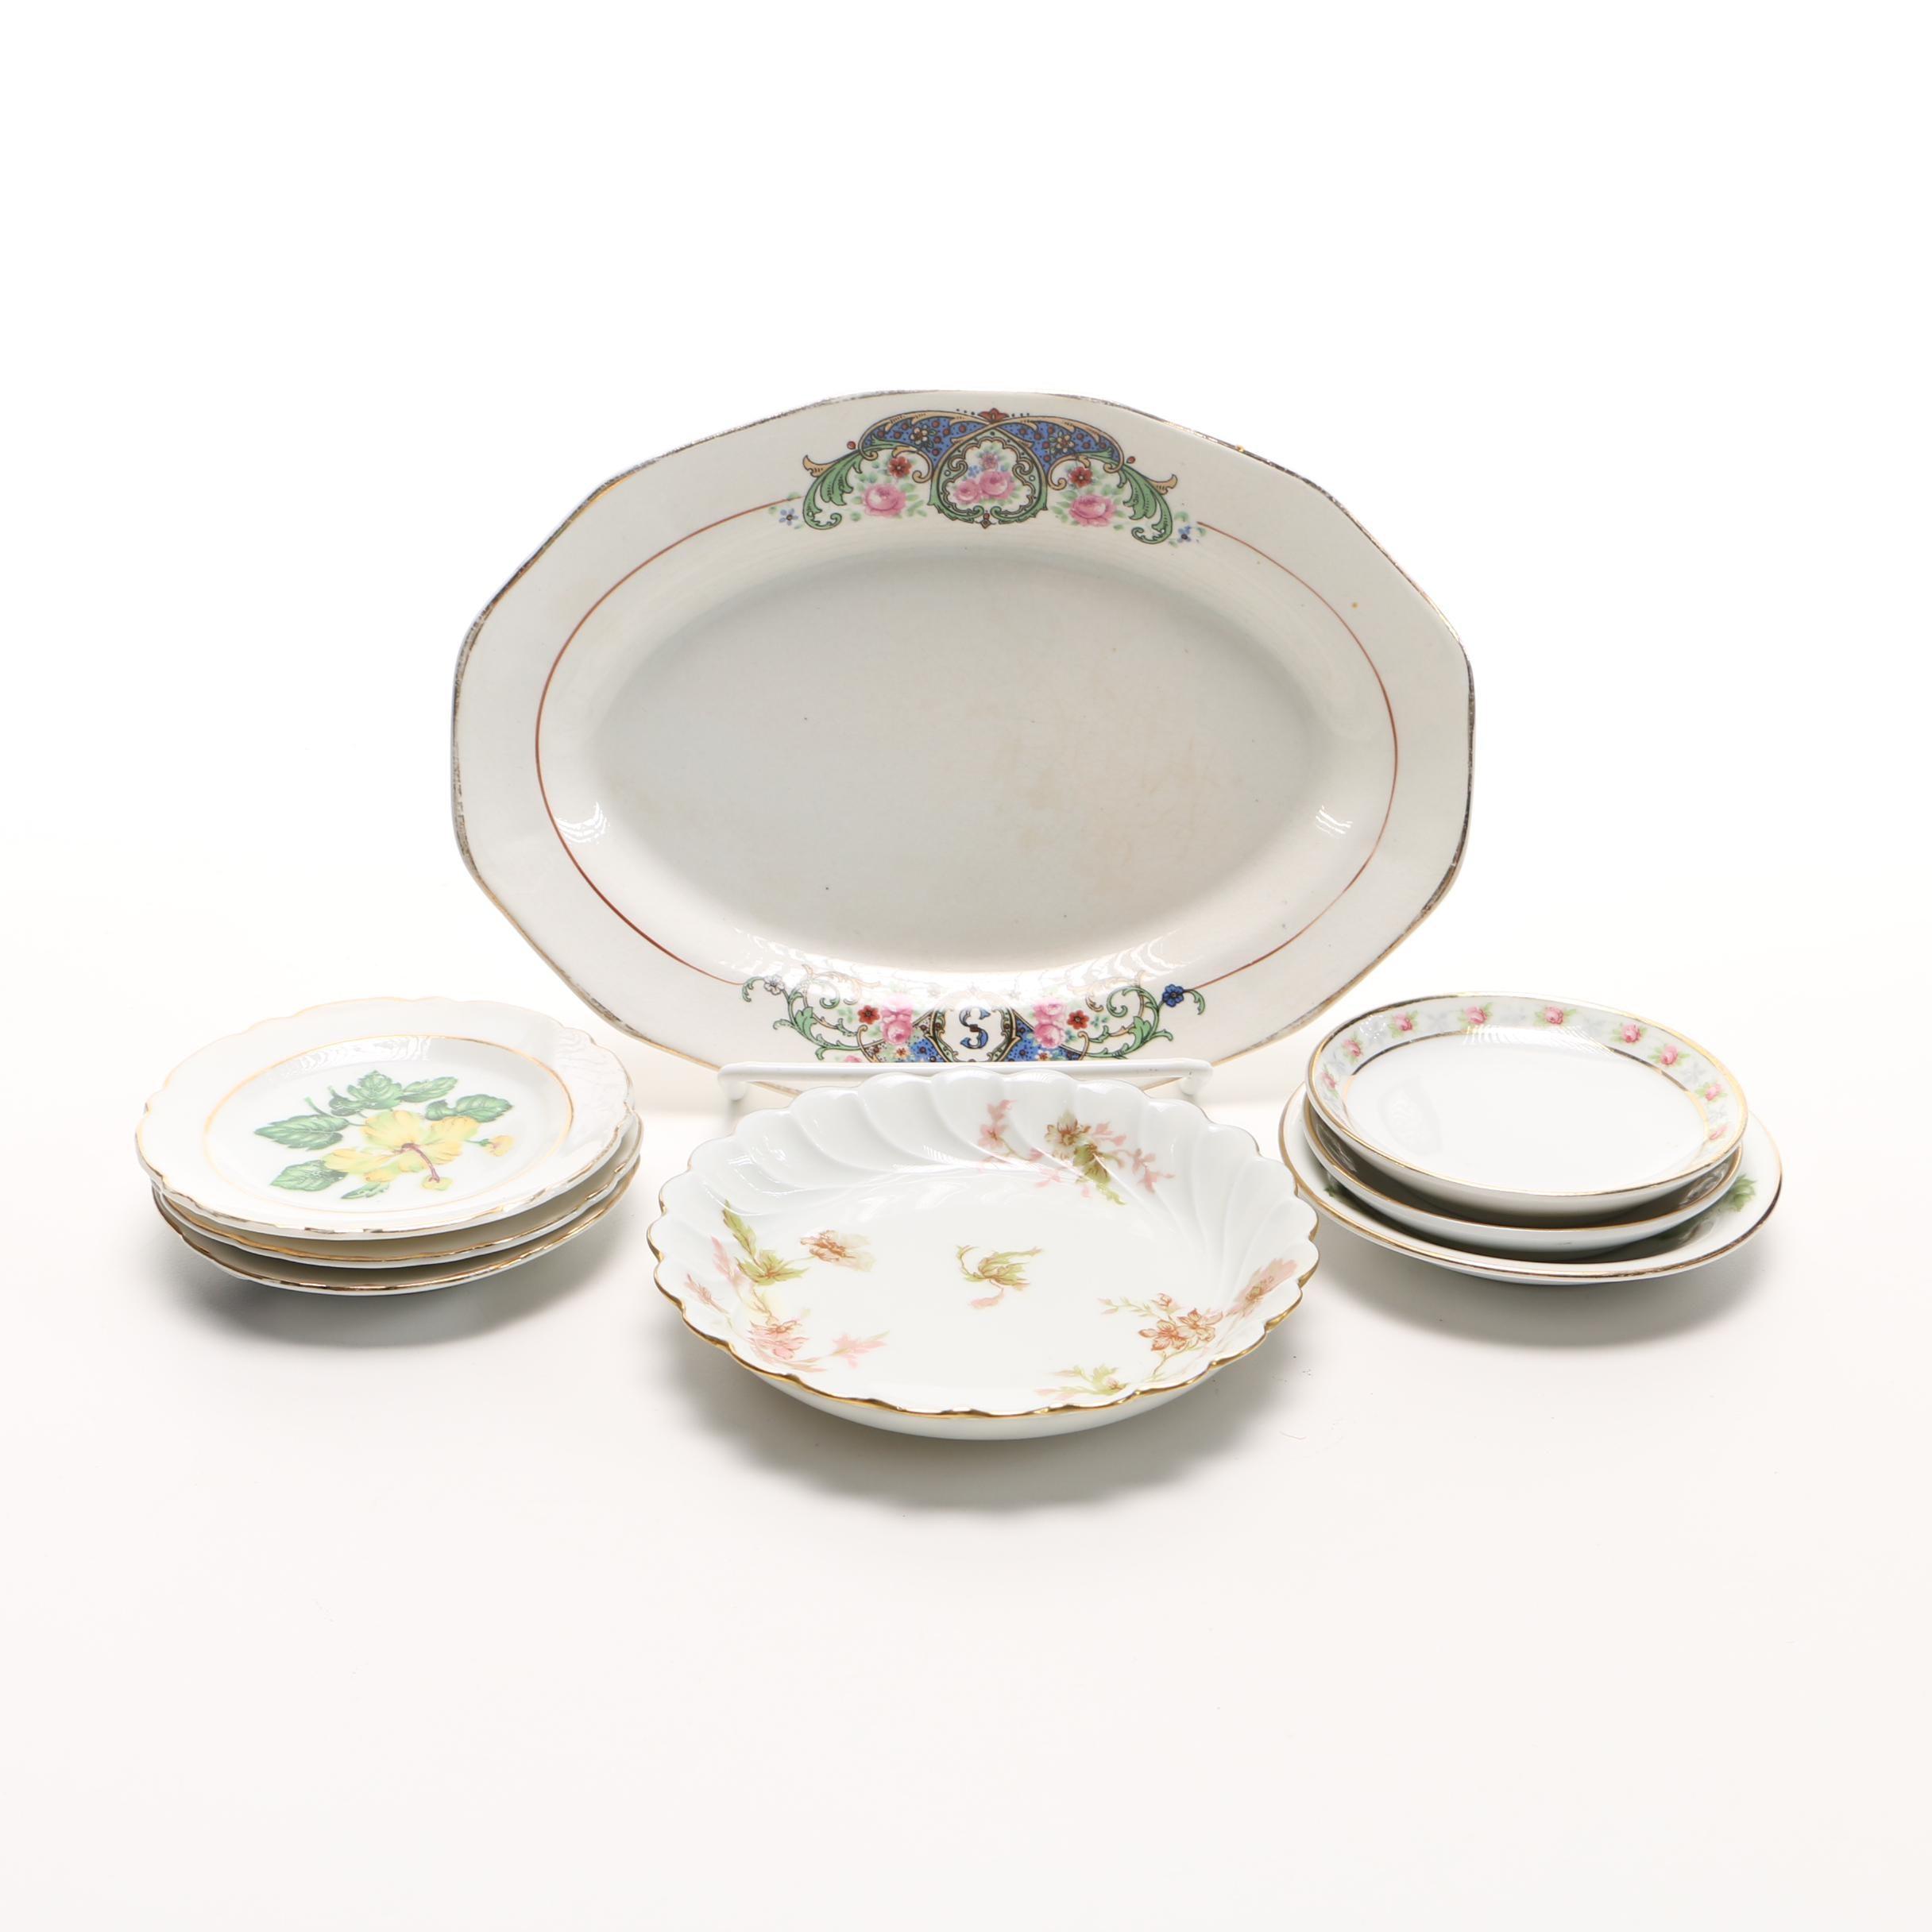 Serveware and Tableware